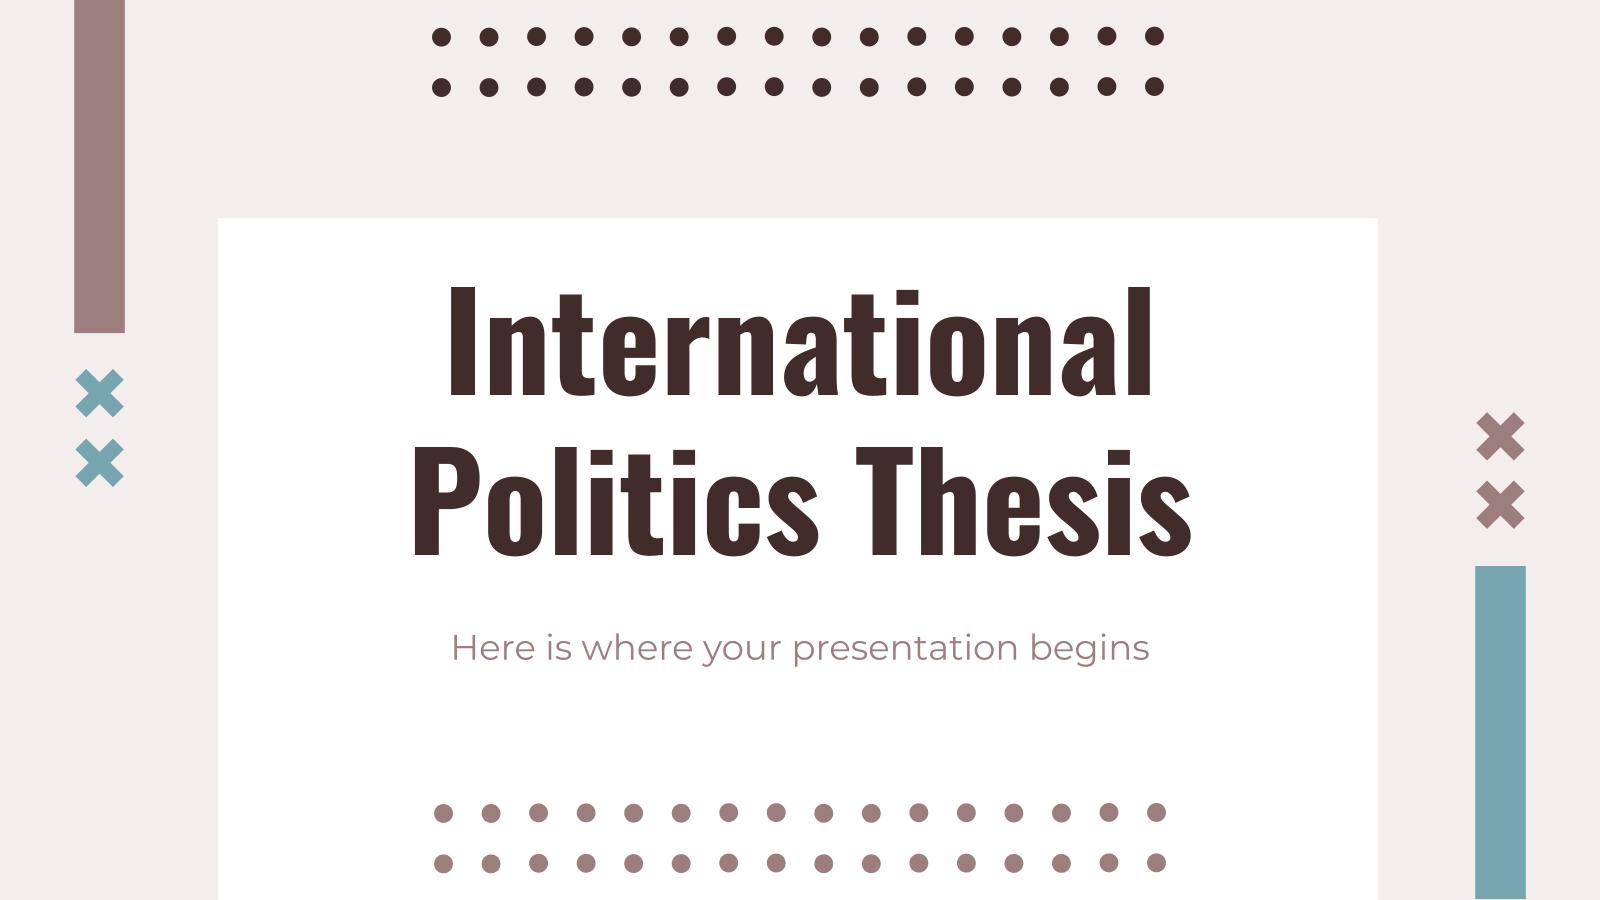 International Politics Thesis presentation template